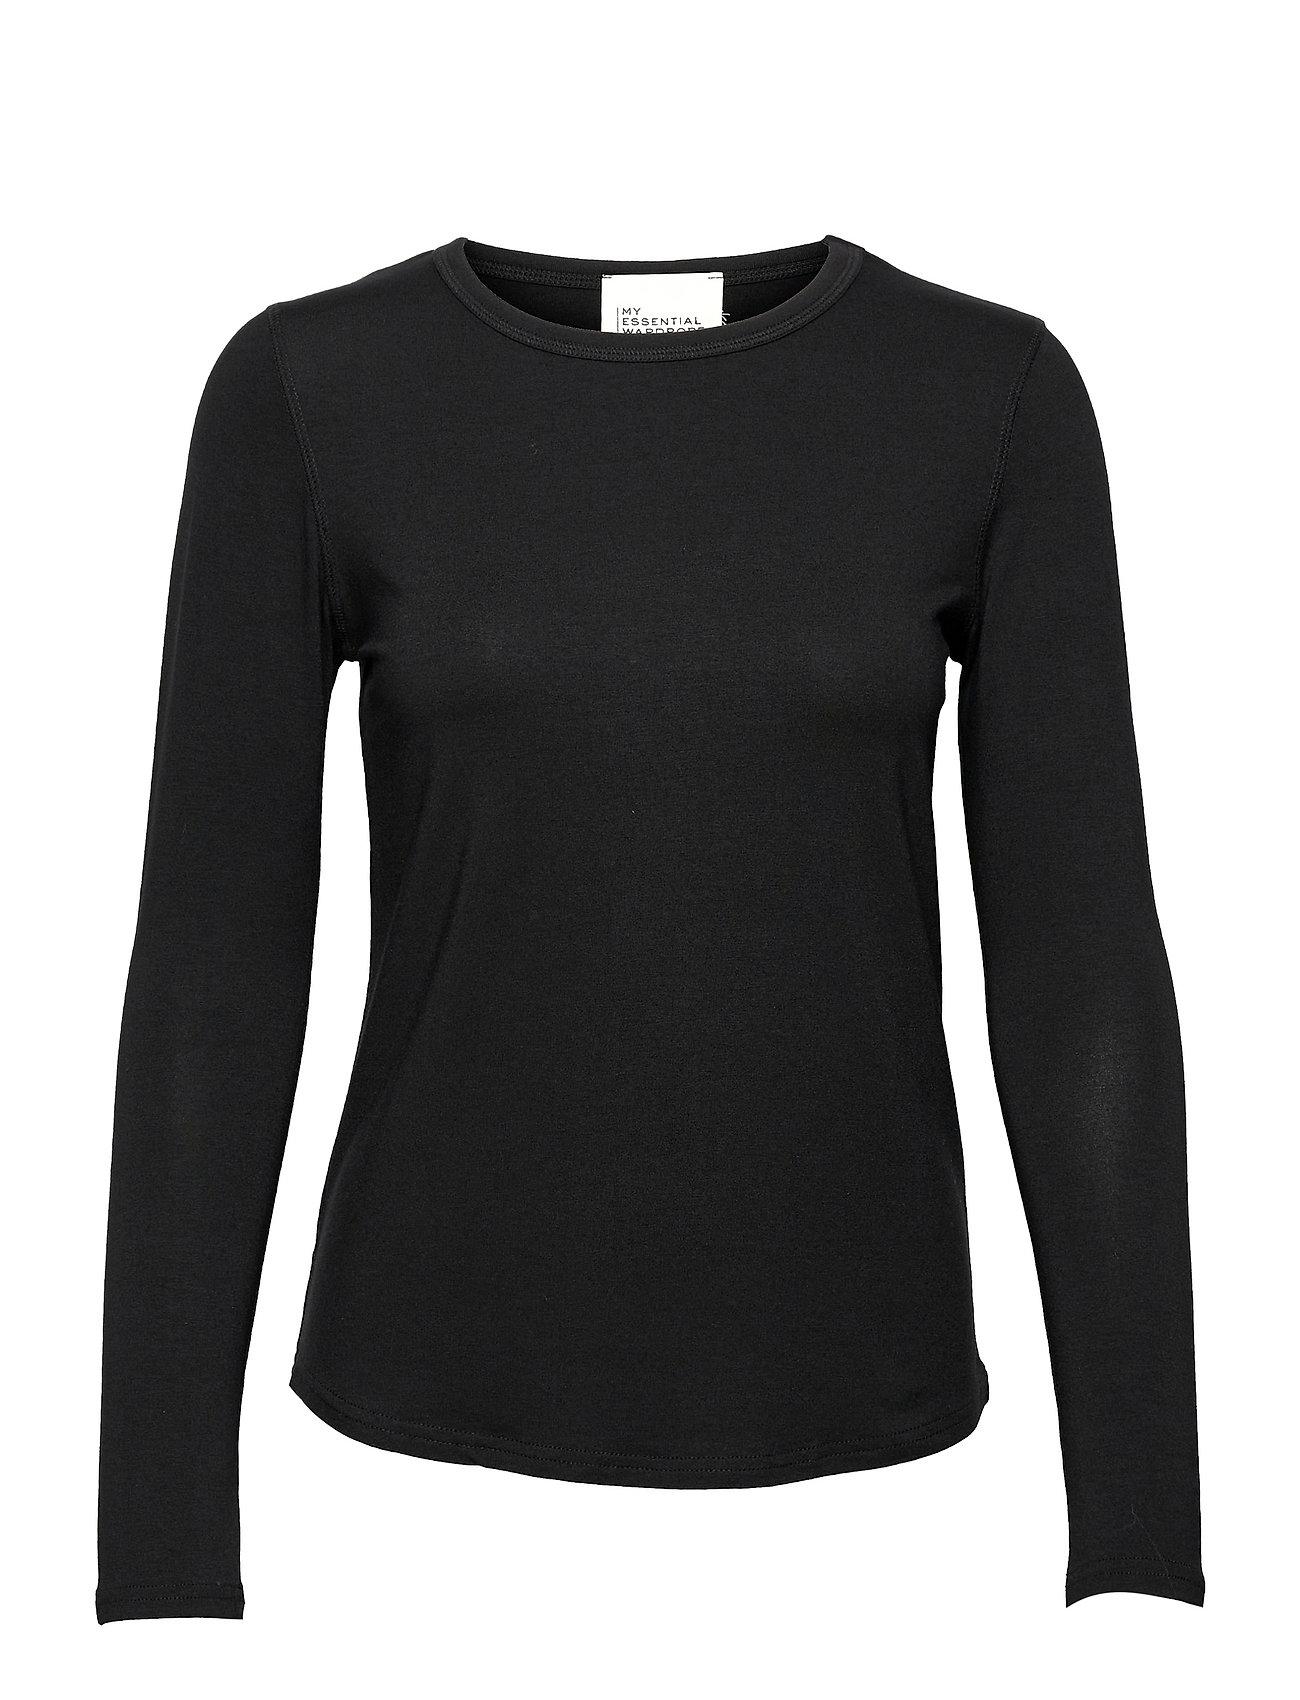 18 The Modal Blouse Langærmet T-shirt Sort My Essential Wardrobe